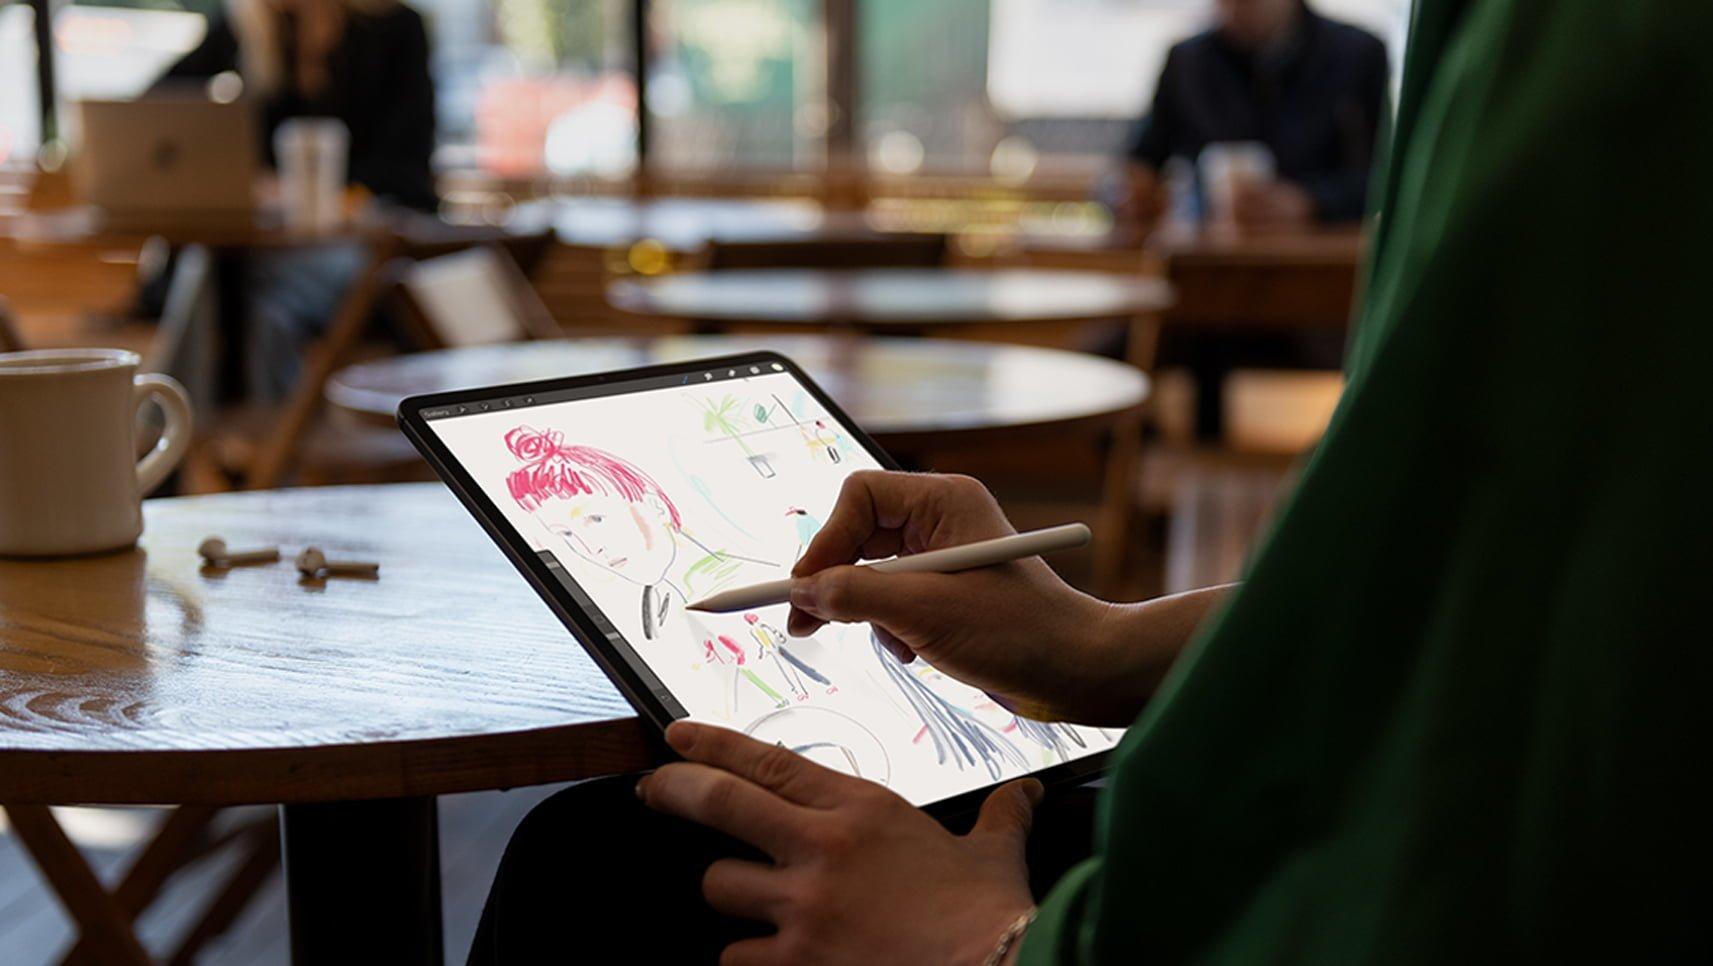 iPad Pro Apple Pencil Sketching